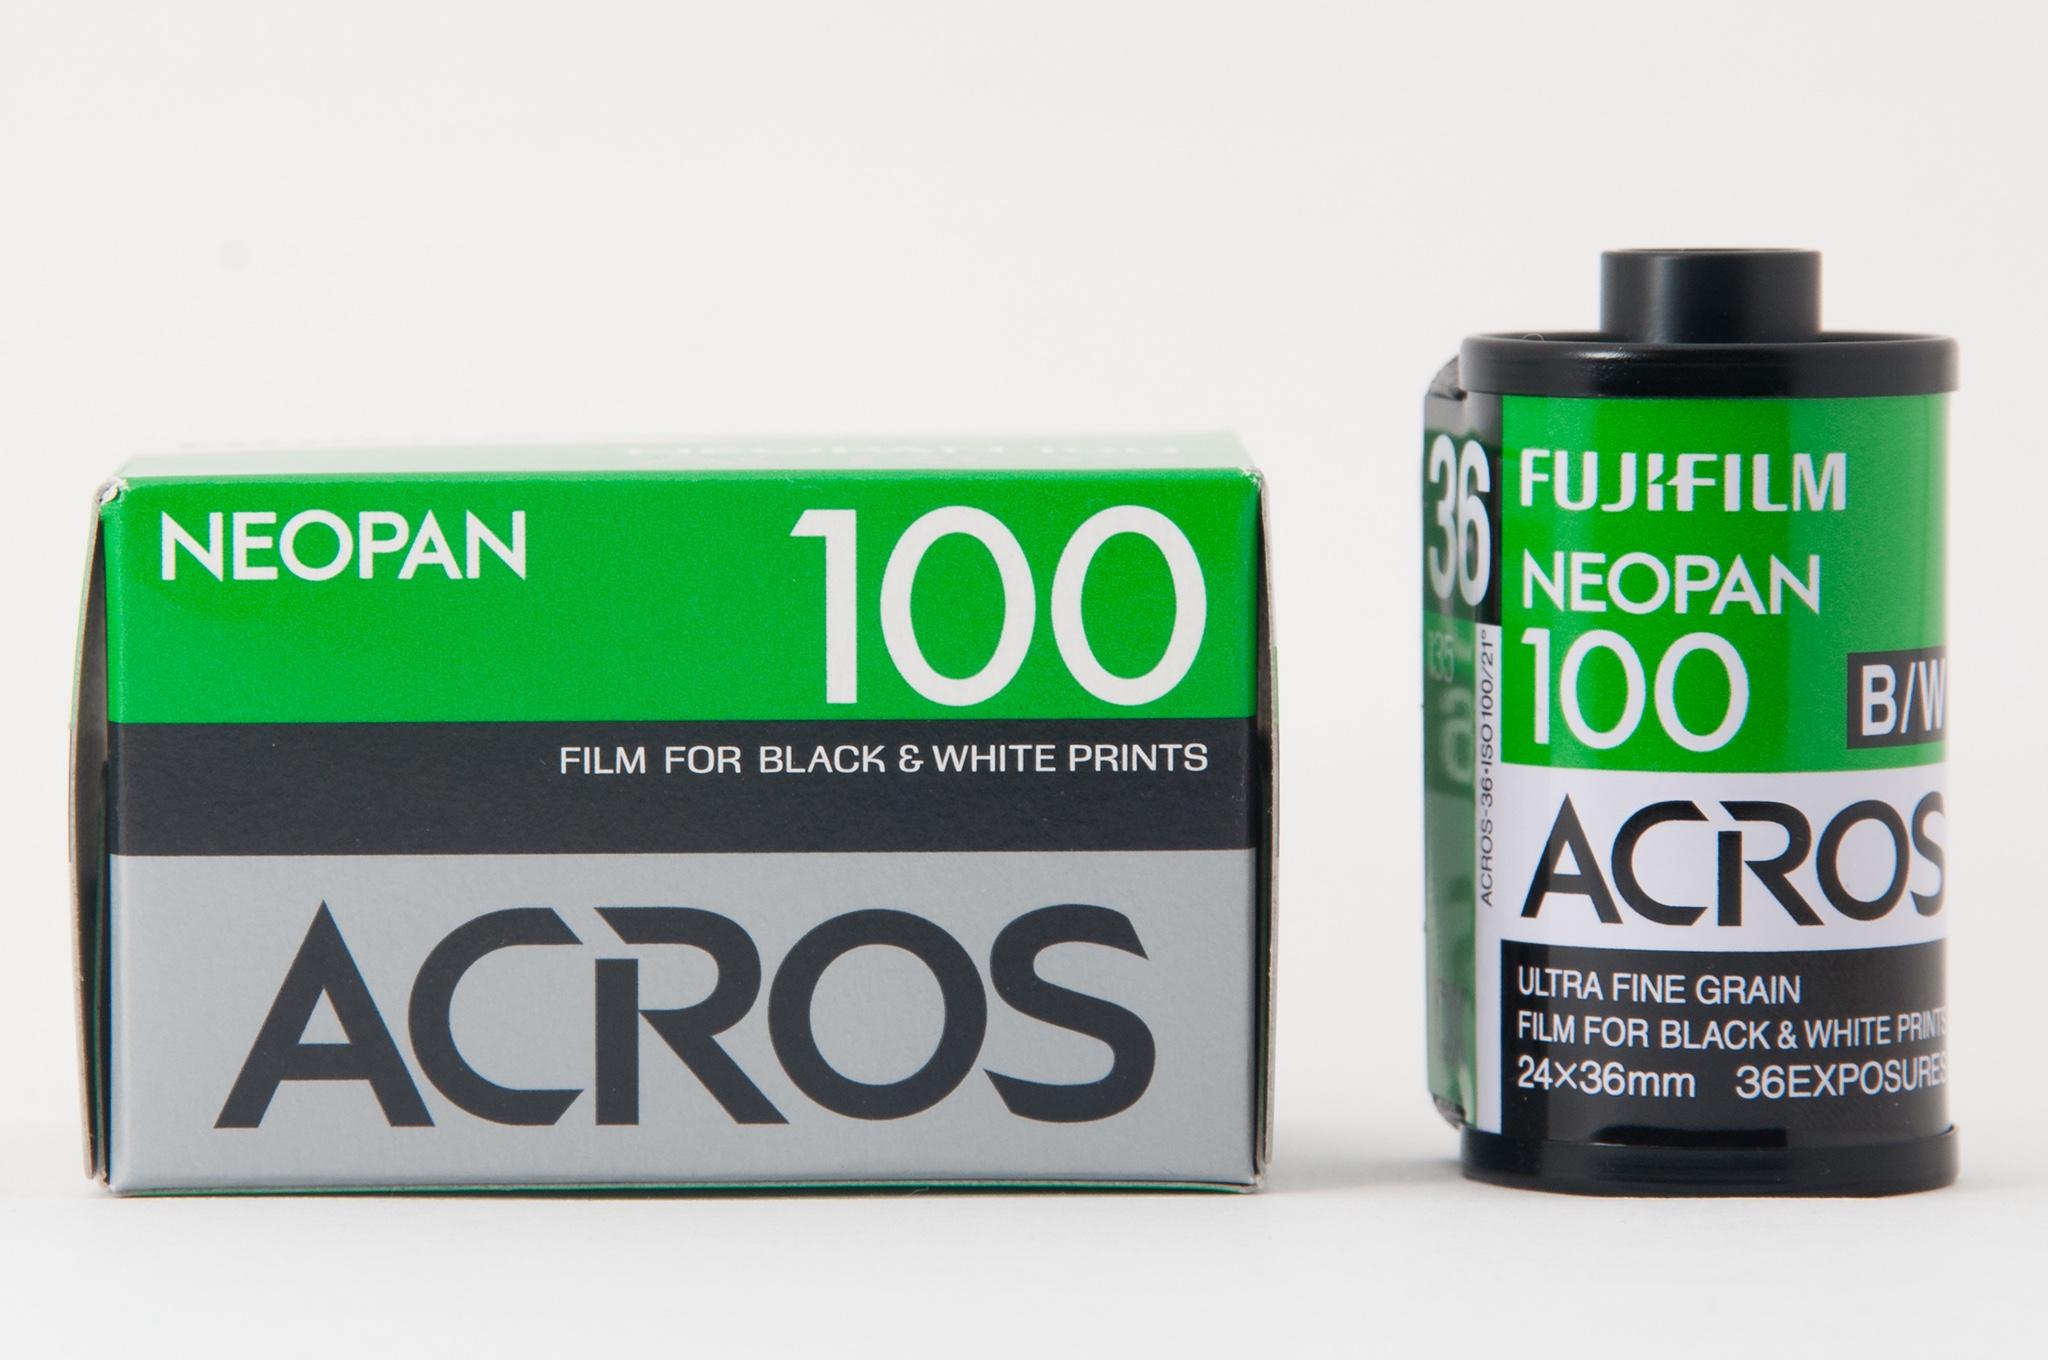 Fujifilm Neopan 100 Acros